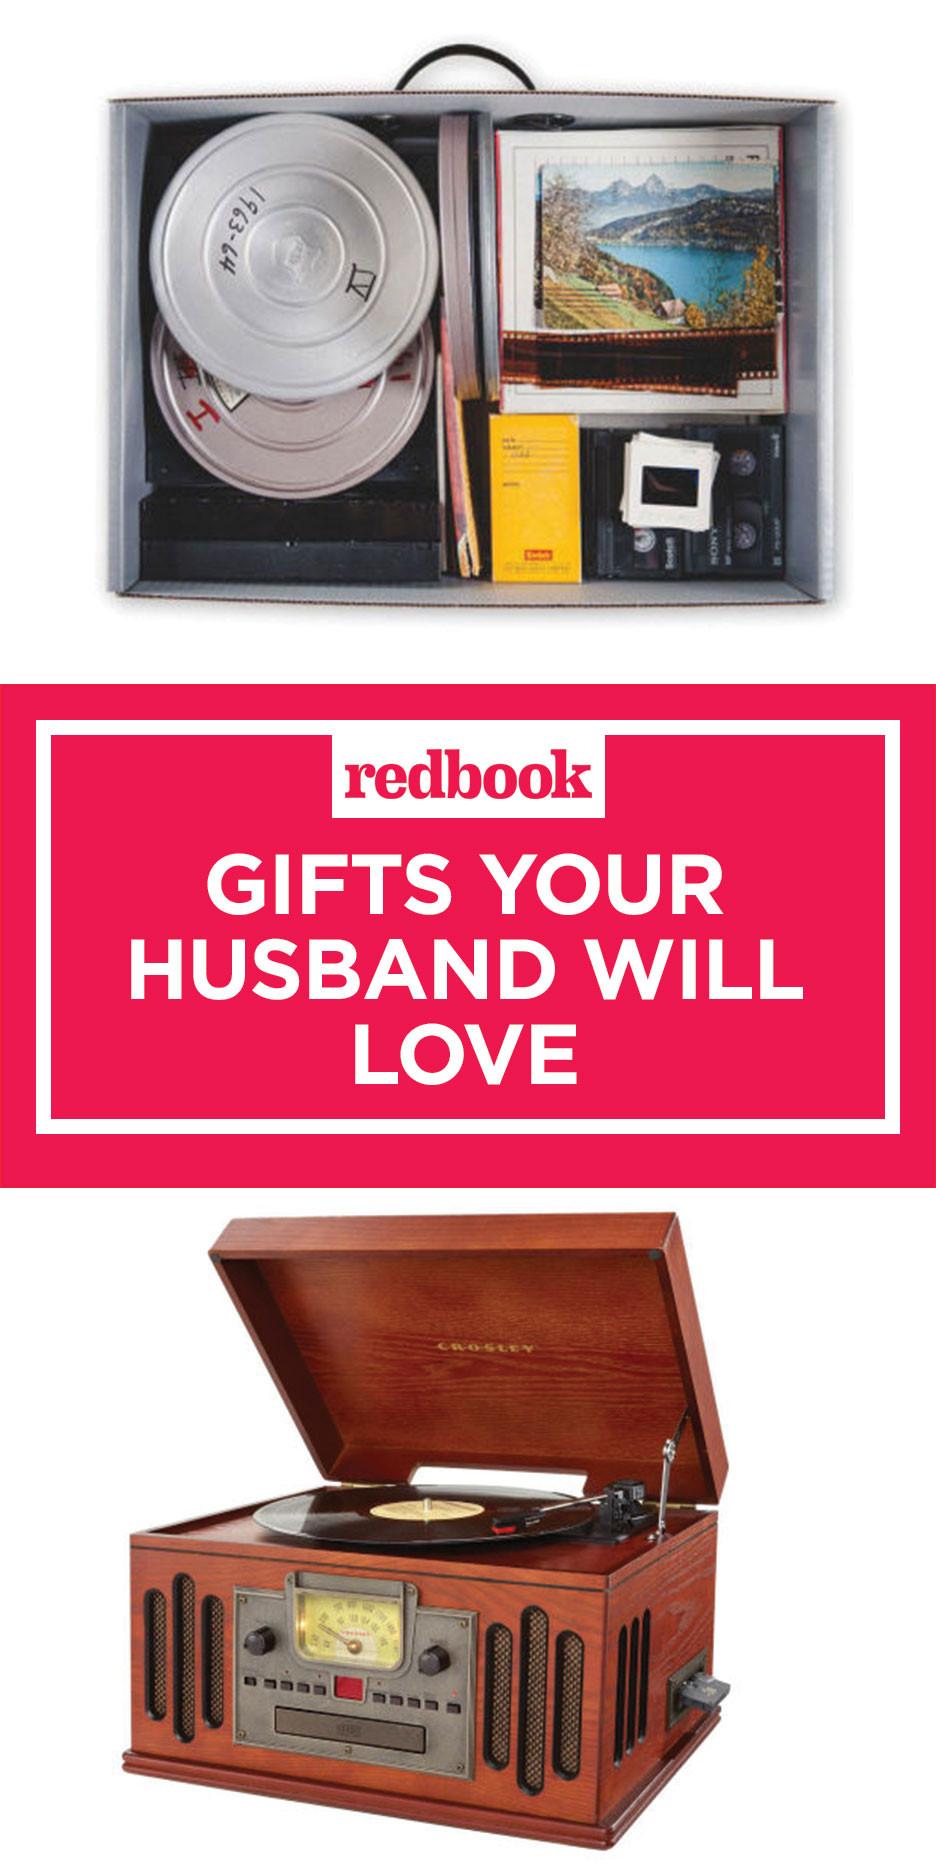 Holiday Gift Ideas Husband  36 Husband Gift Ideas Christmas Gifts for Husband